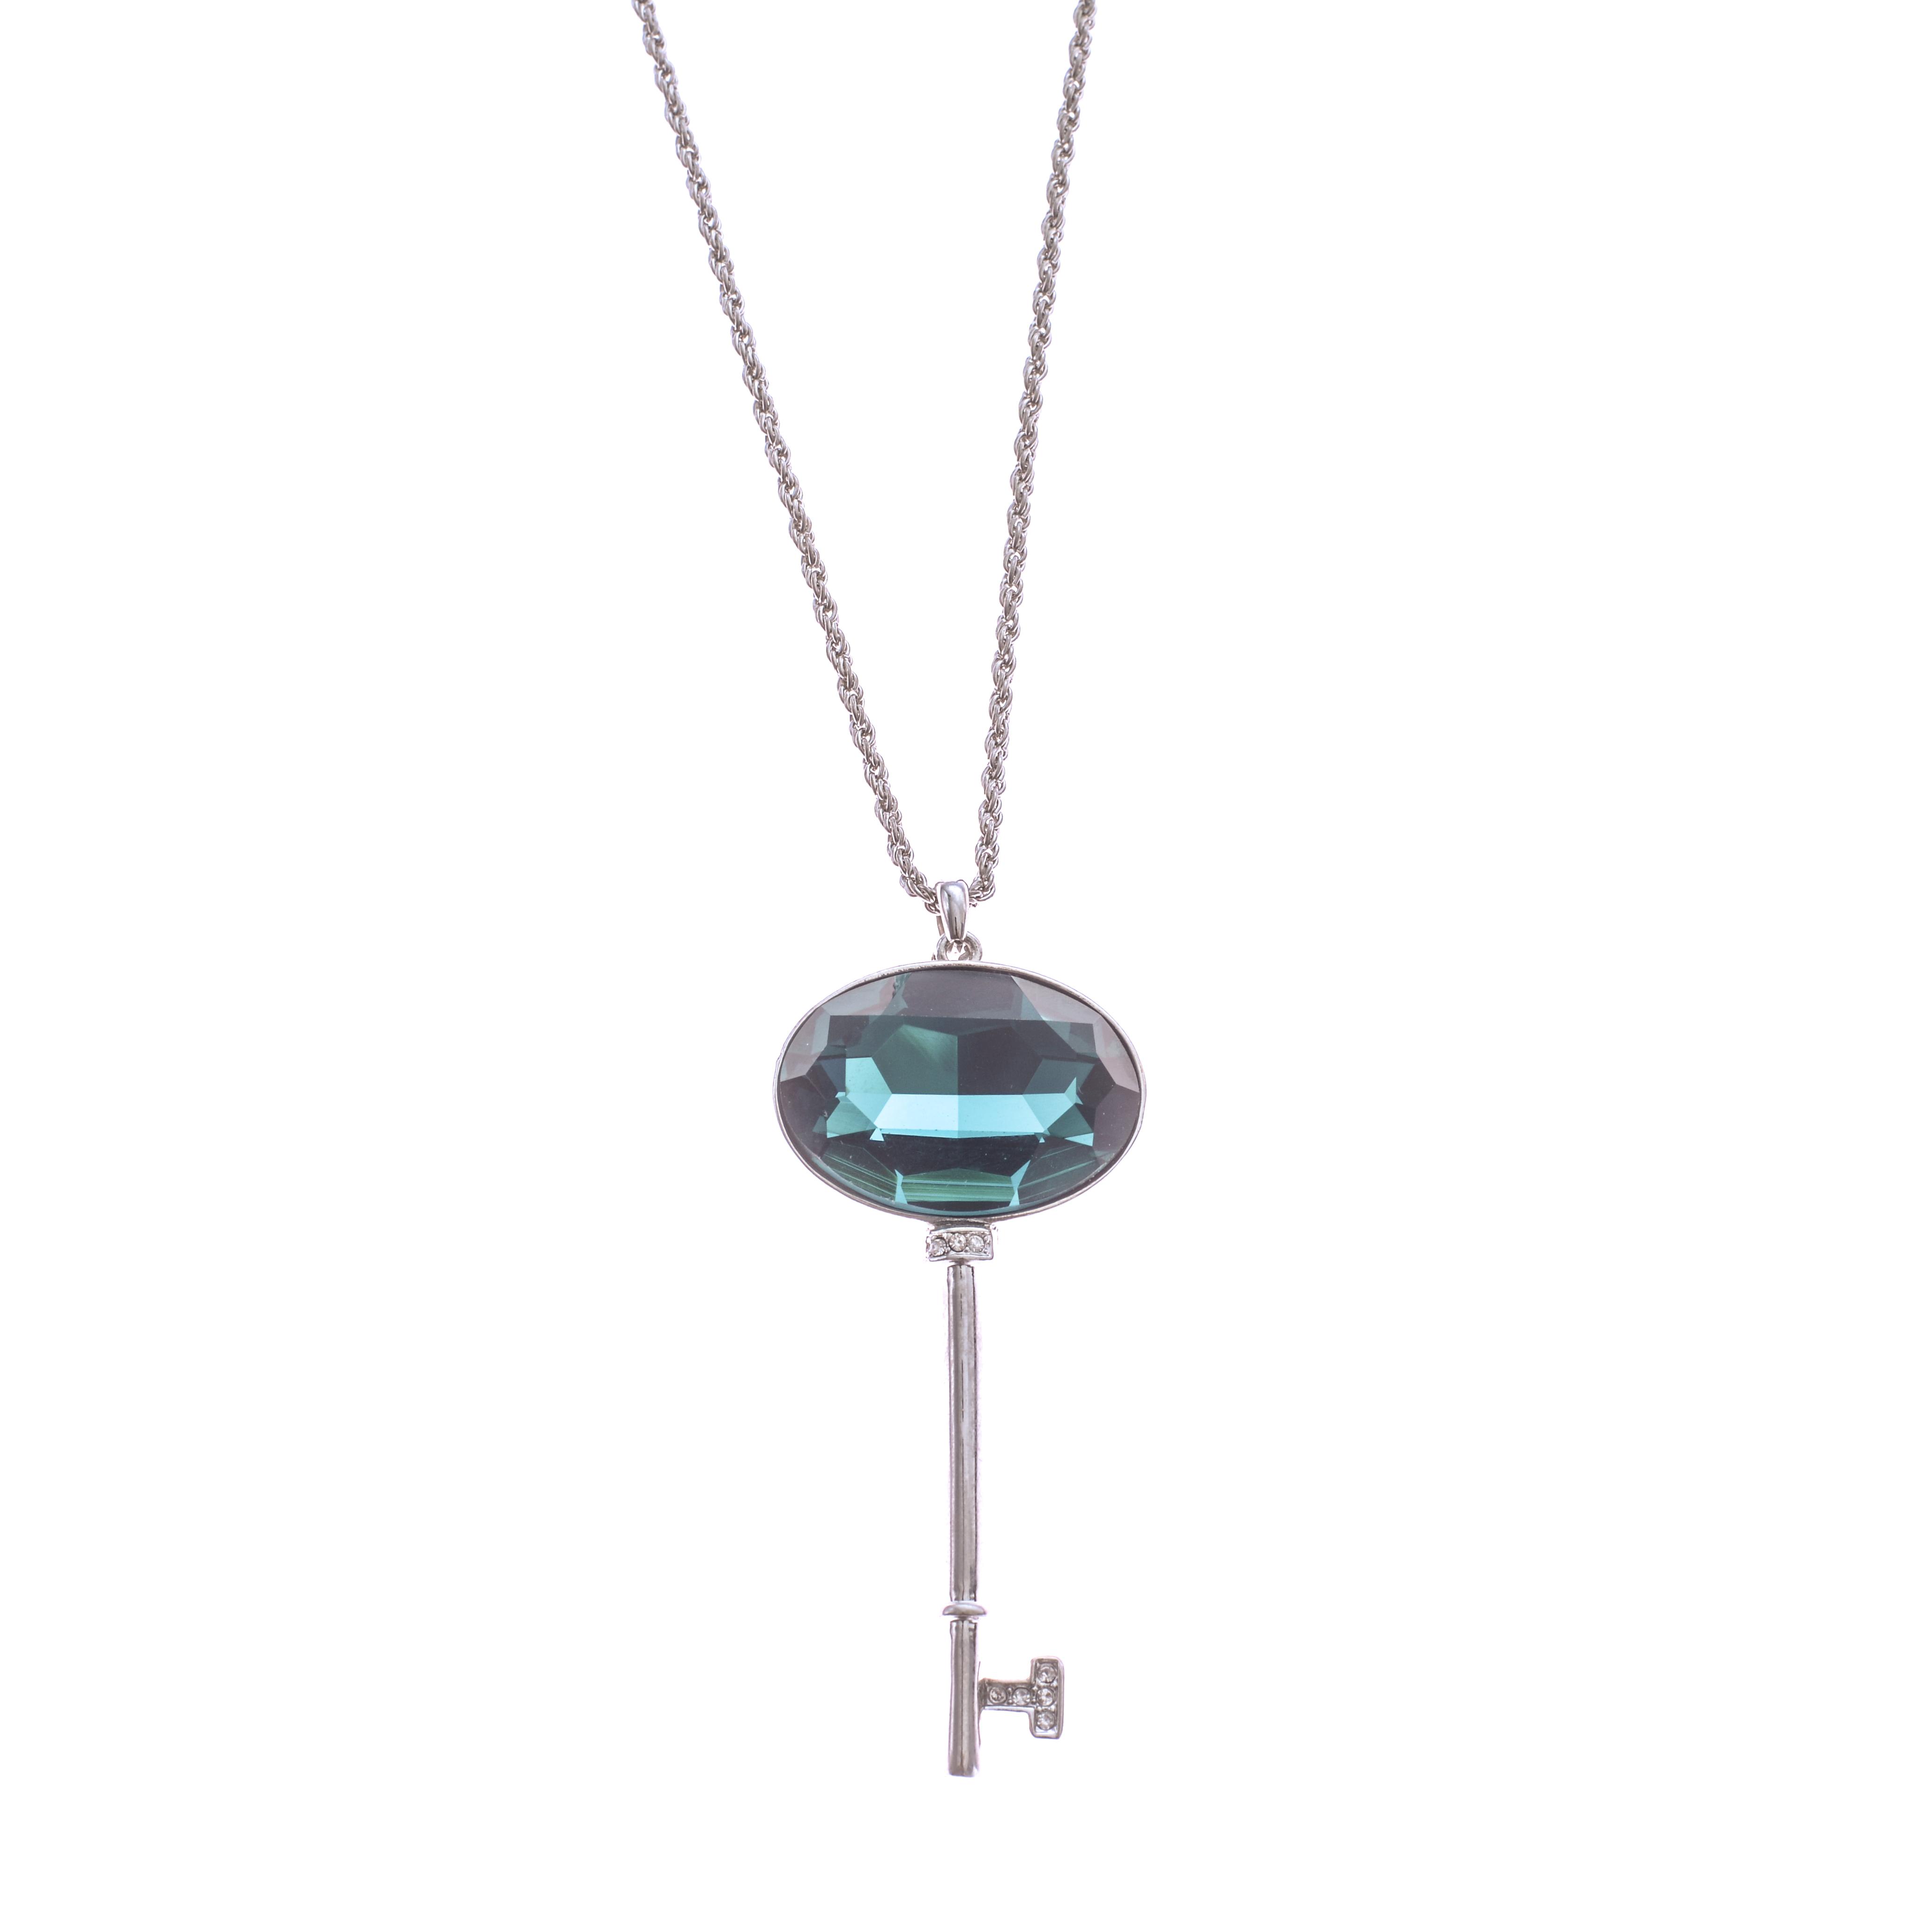 Lant Blue Key